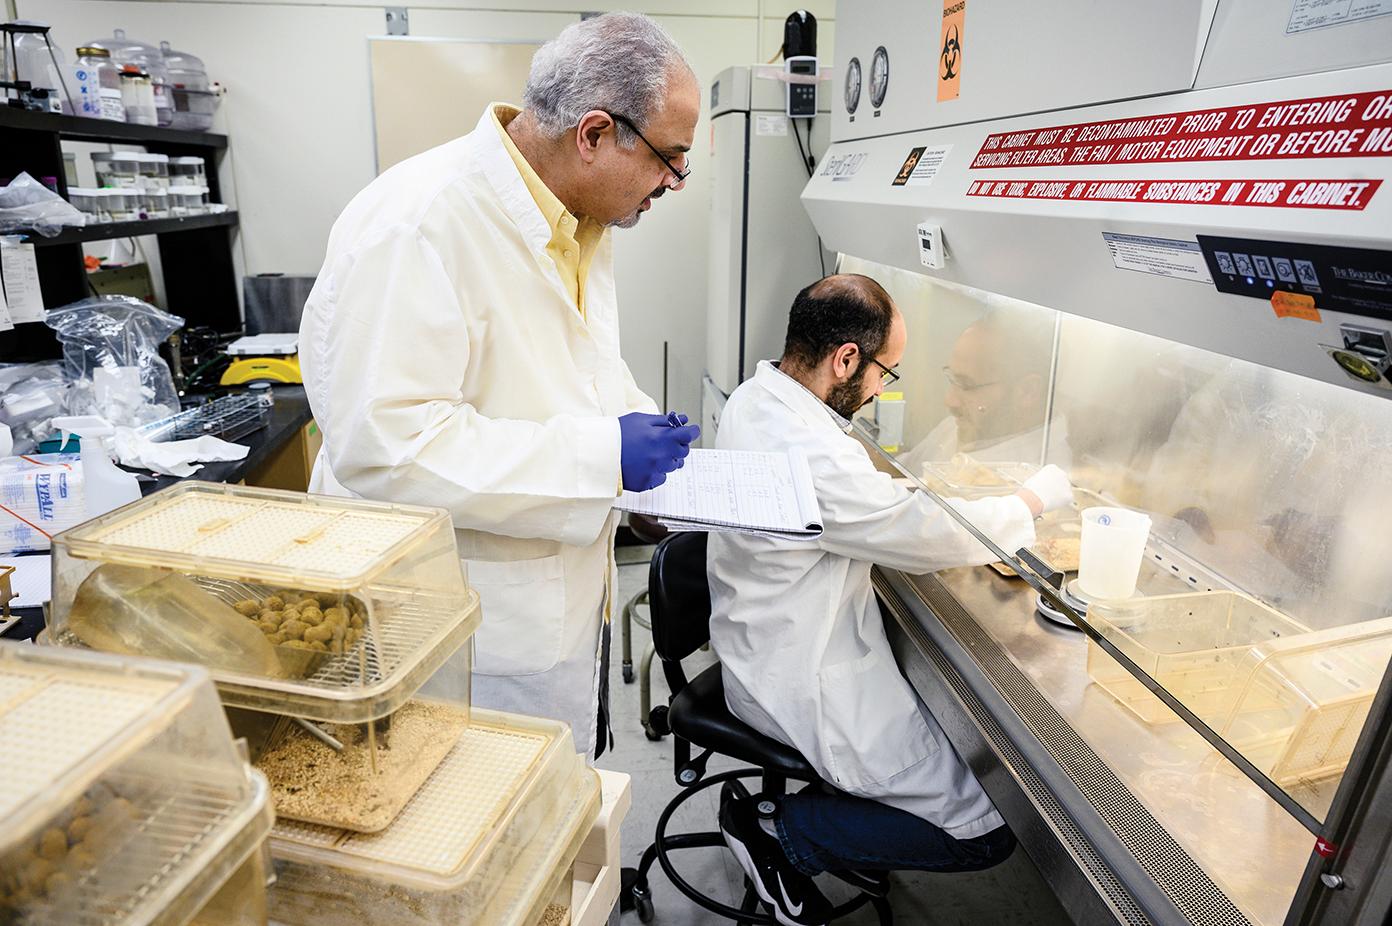 Two scientist work side by side in lab under hood